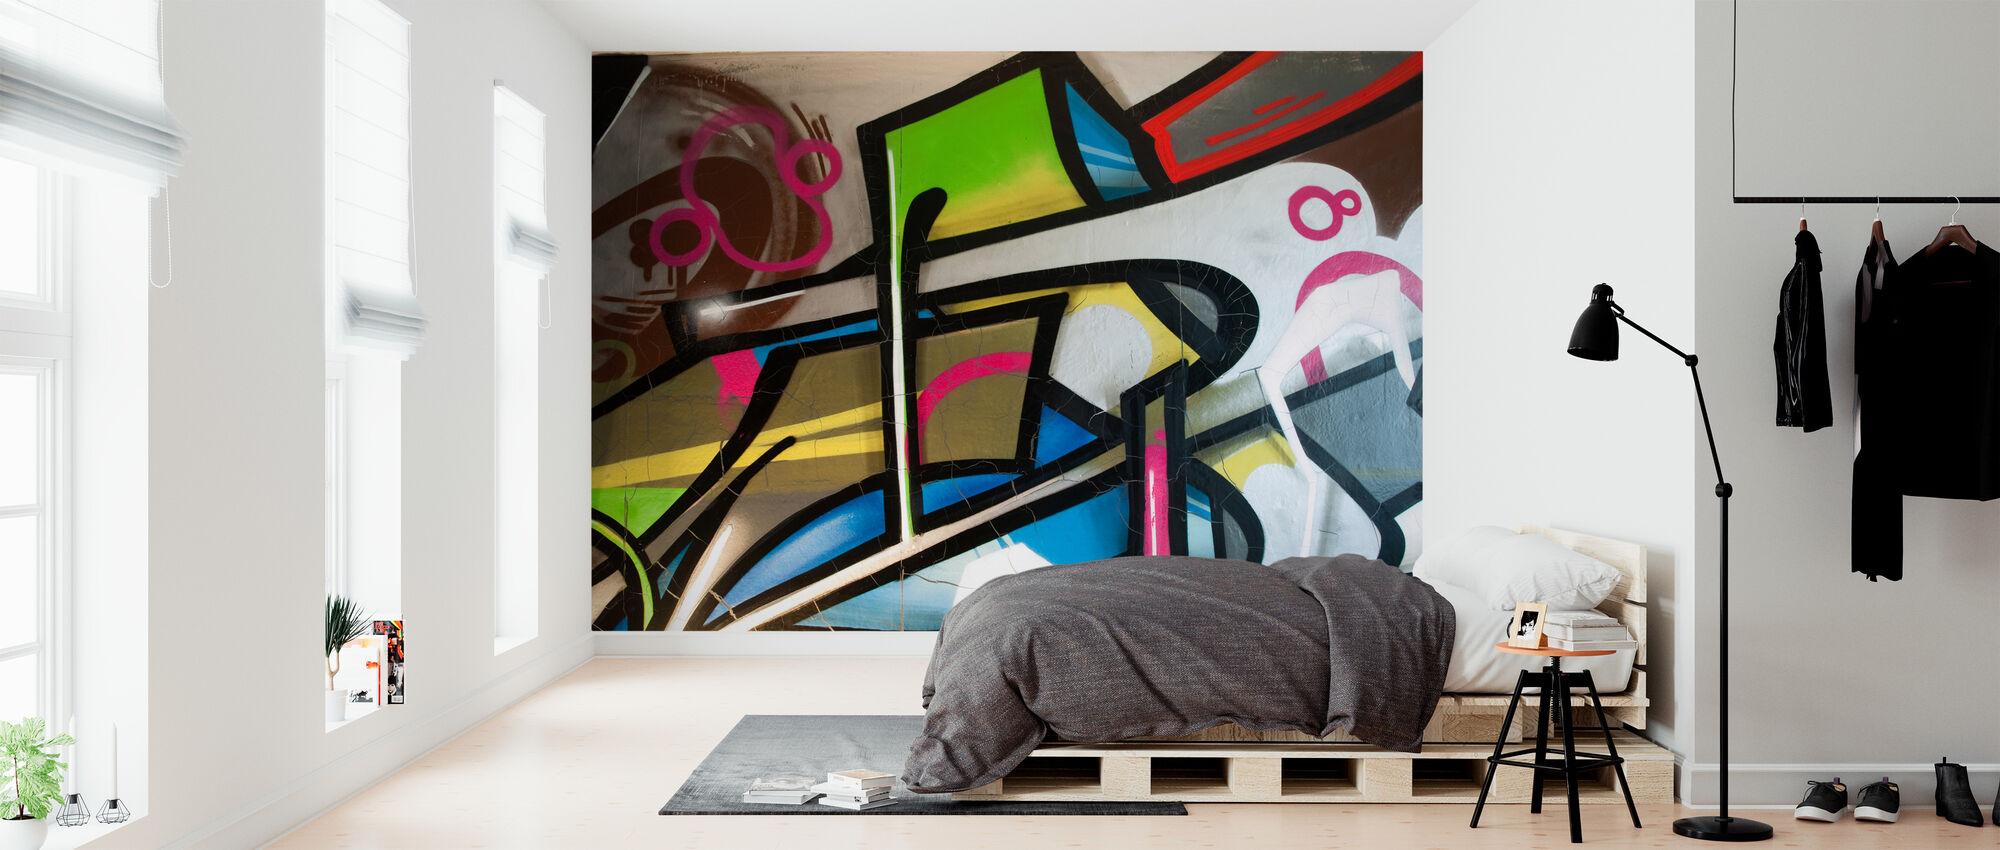 Färgglada graffiti - Tapet - Sovrum